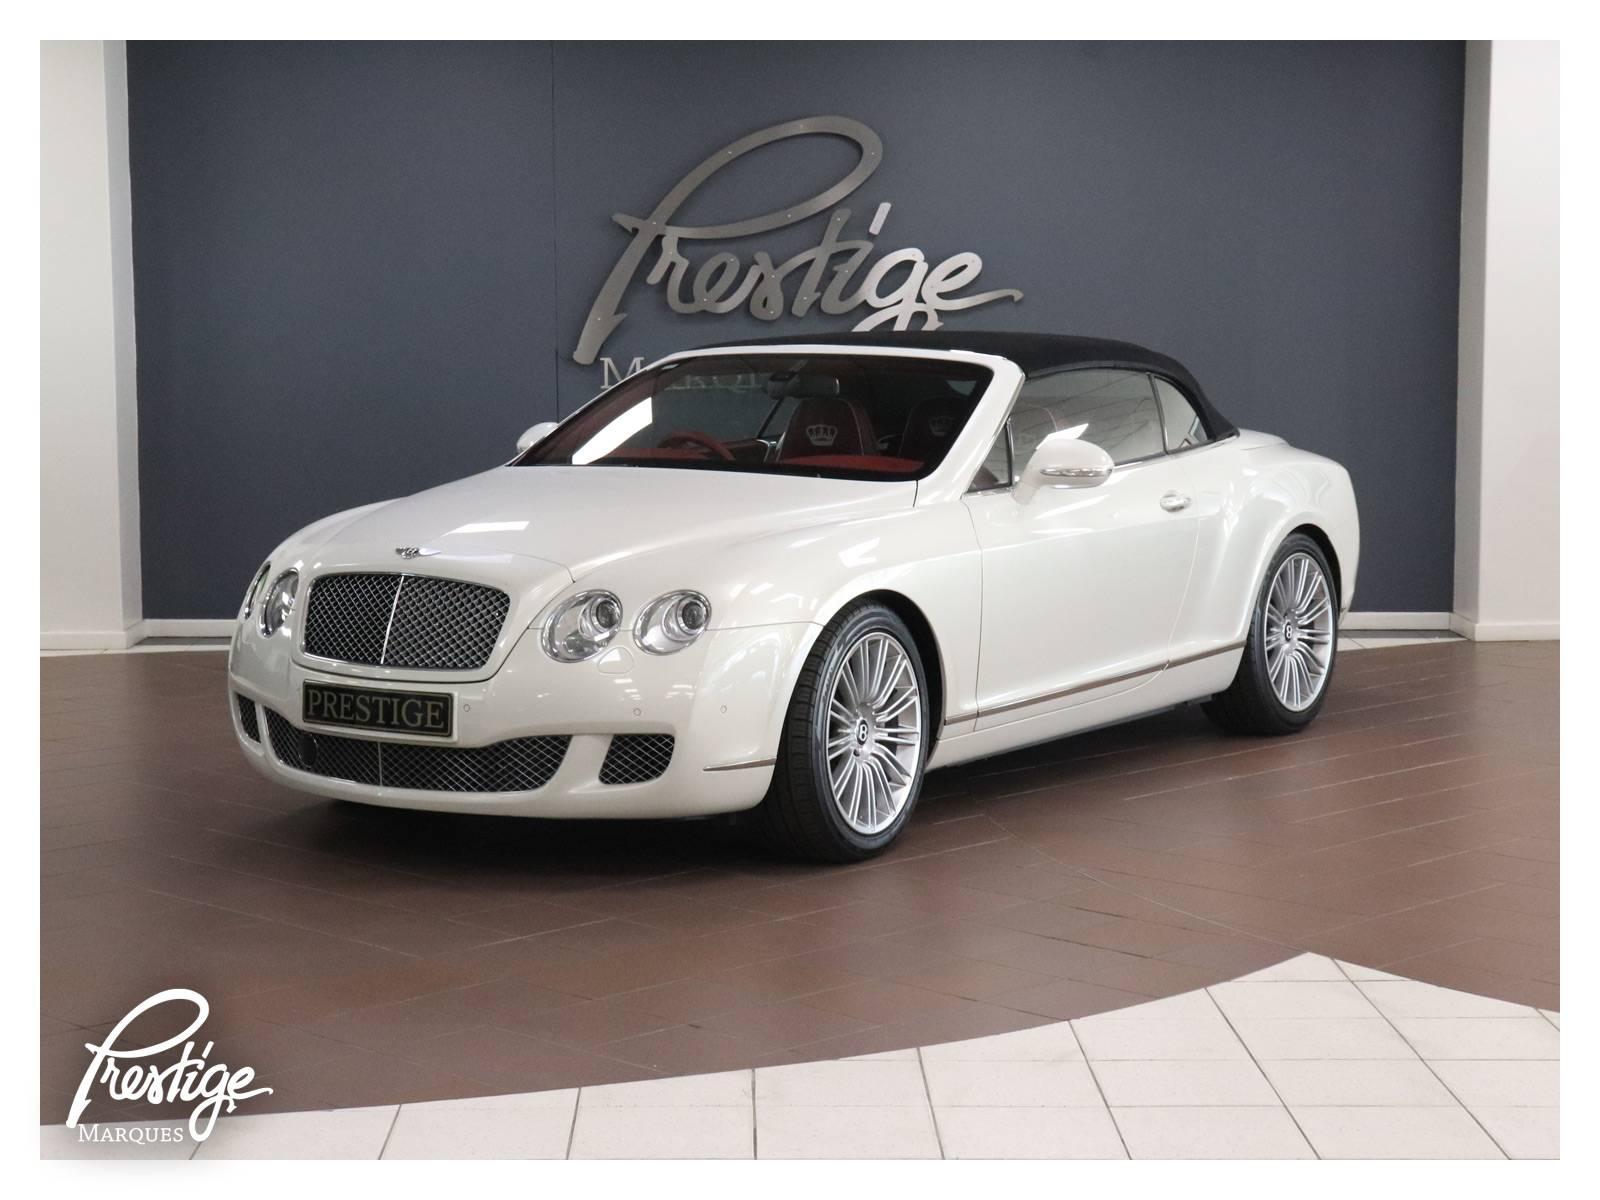 2011-Bentley-continental-Prestige-Marques-Randburg-Sandton-6